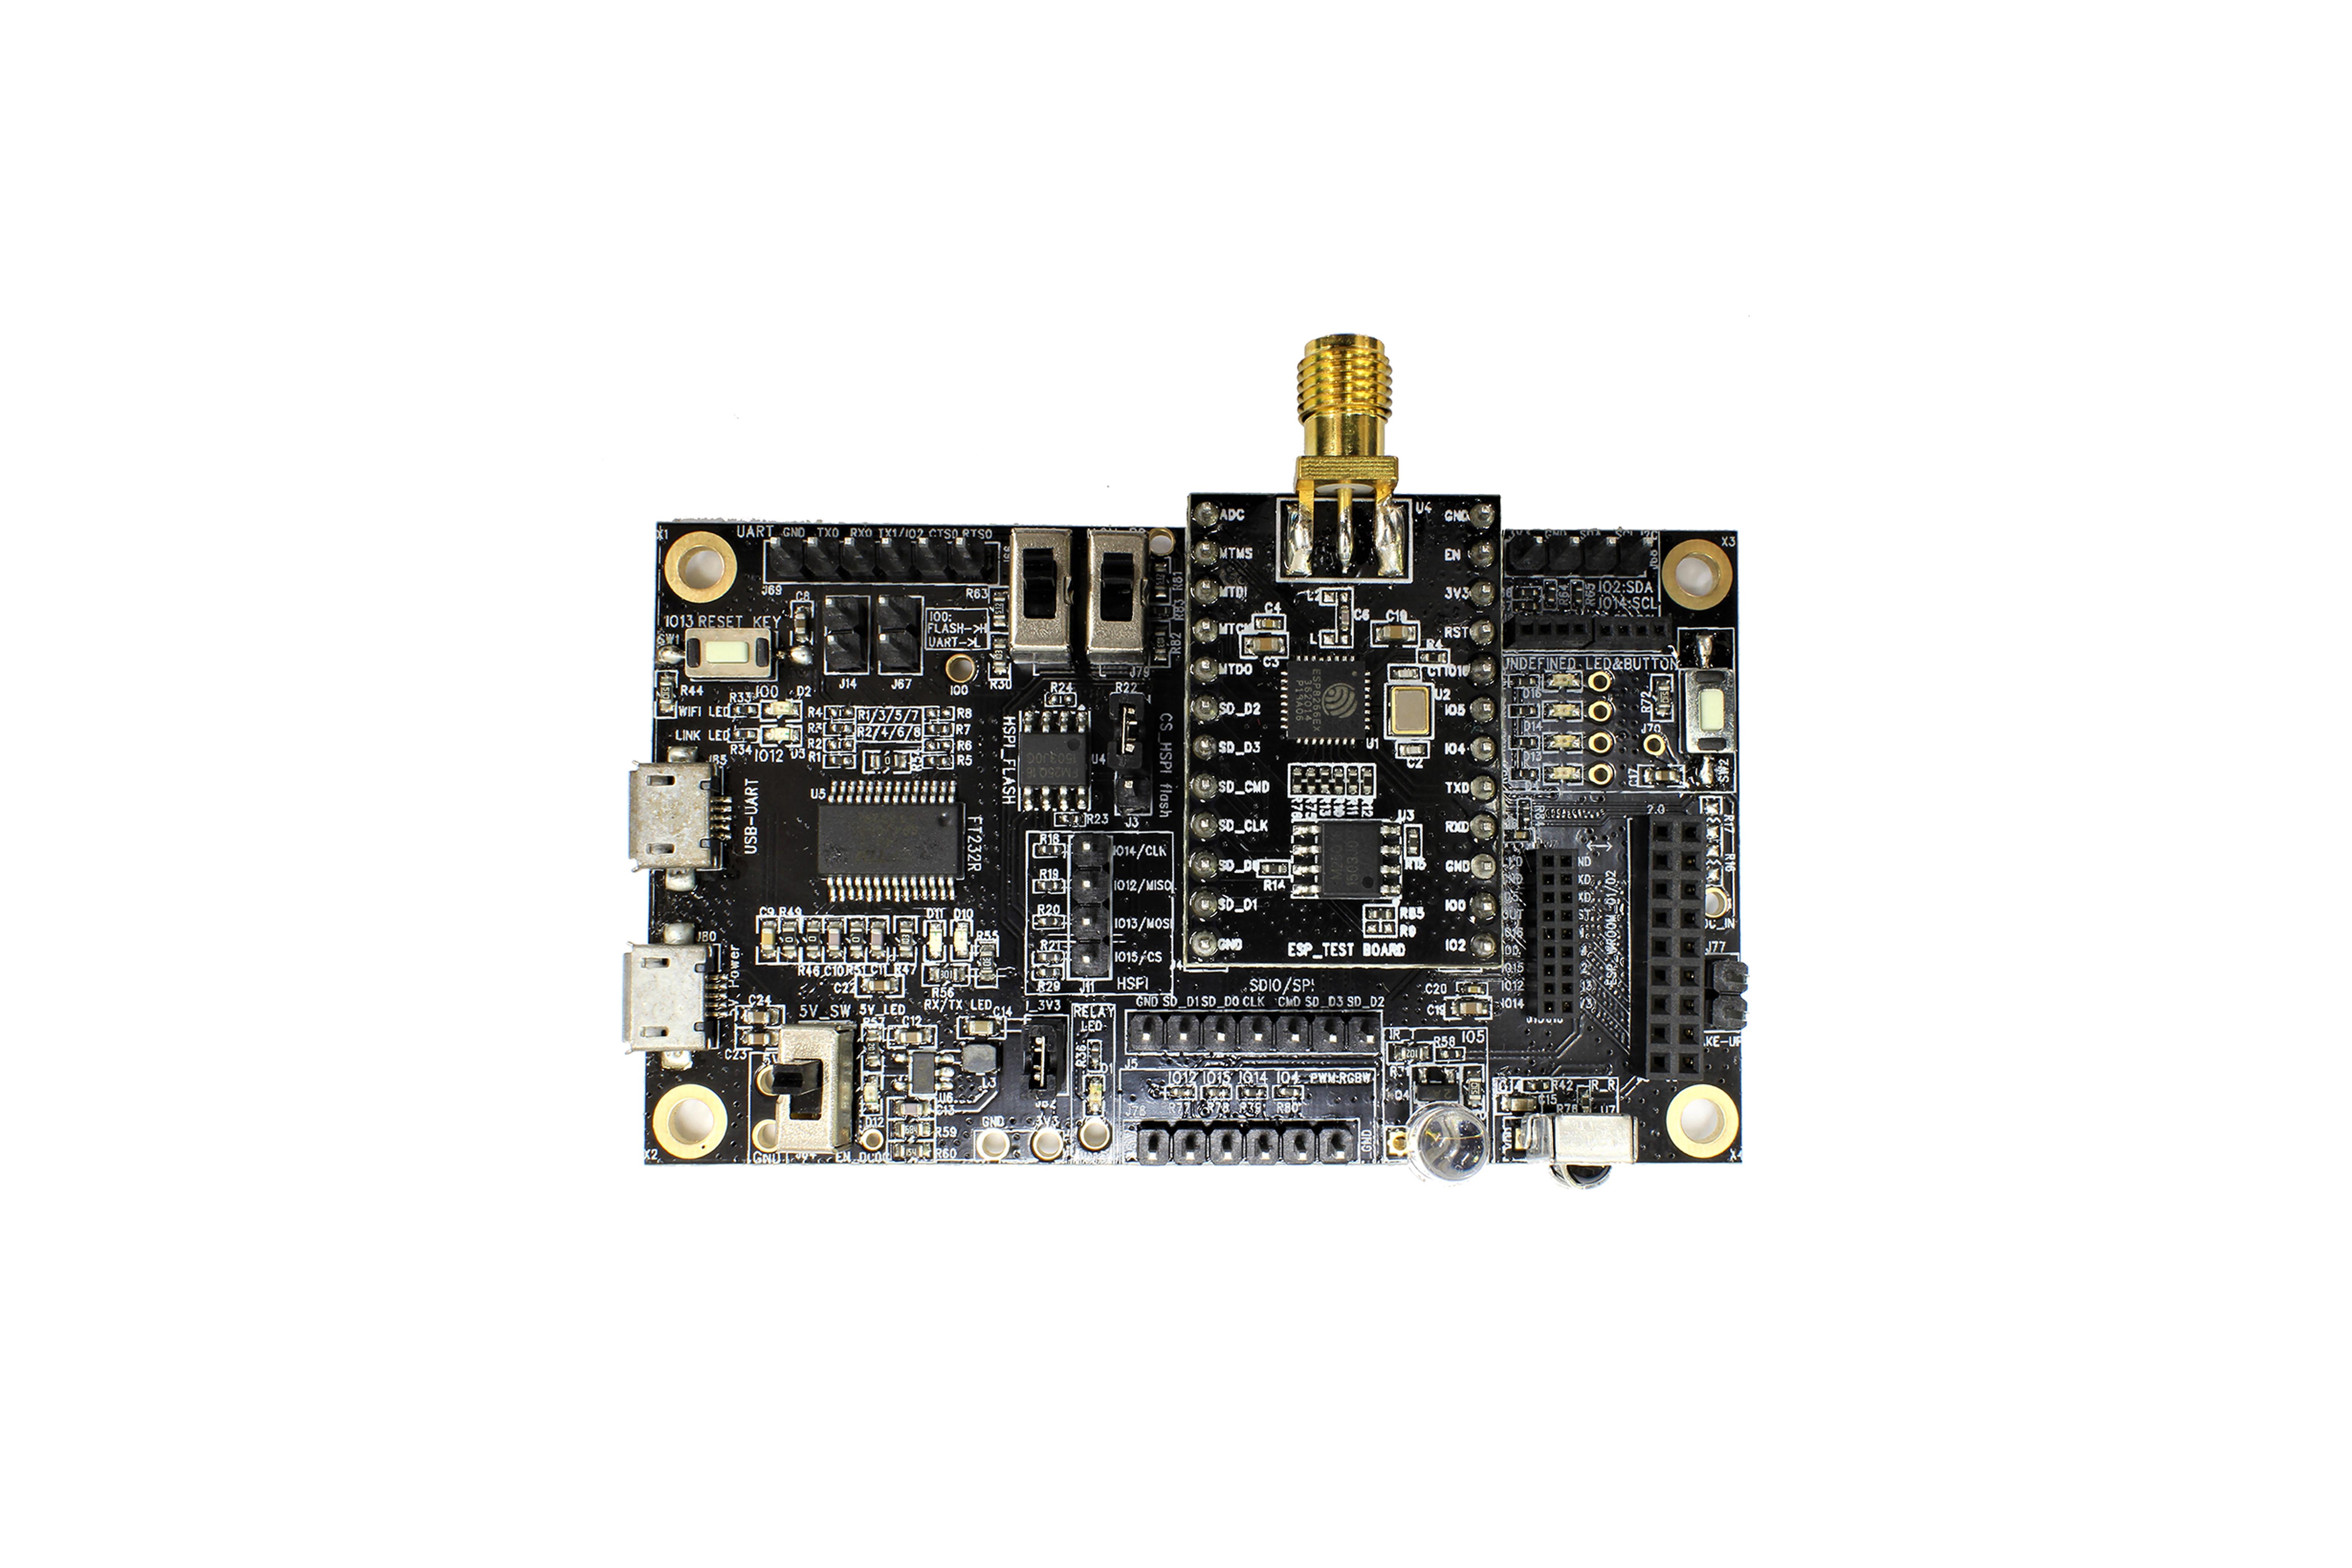 Kit di sviluppo ESP-LAUNCHER ESP8266